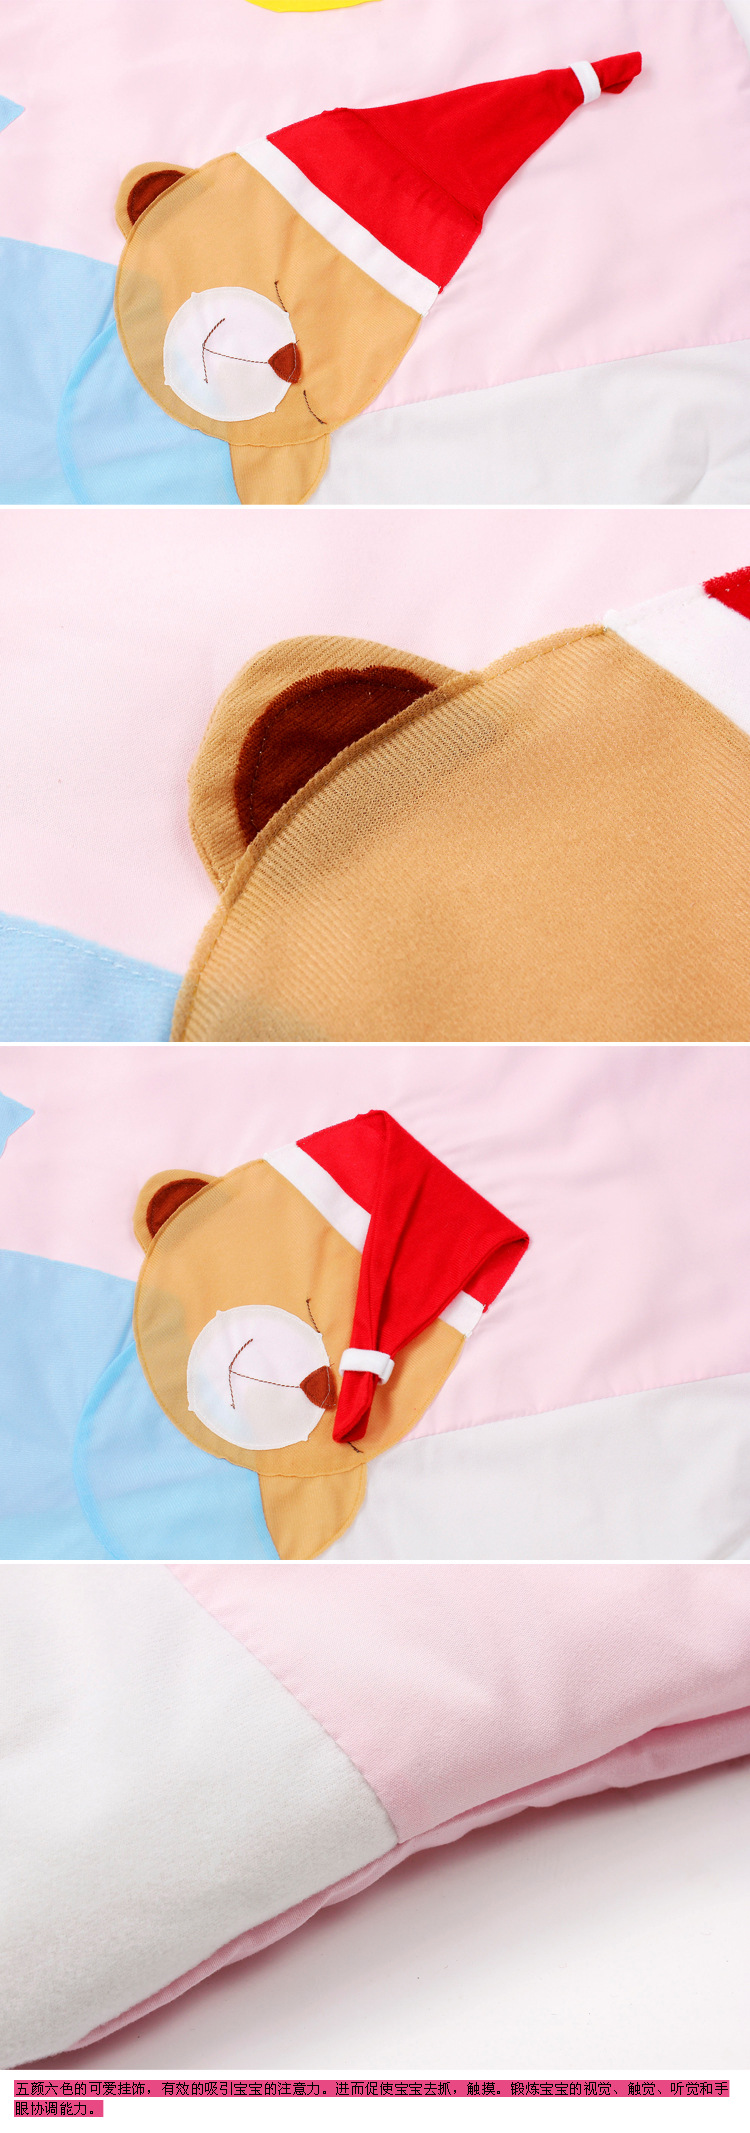 Fun Cartoon Sleeping Bear Soft Baby Play Mat Toy Kids Toddler Musical Gym Activity Play Blanket Baby Indoor Crawling Pads 3